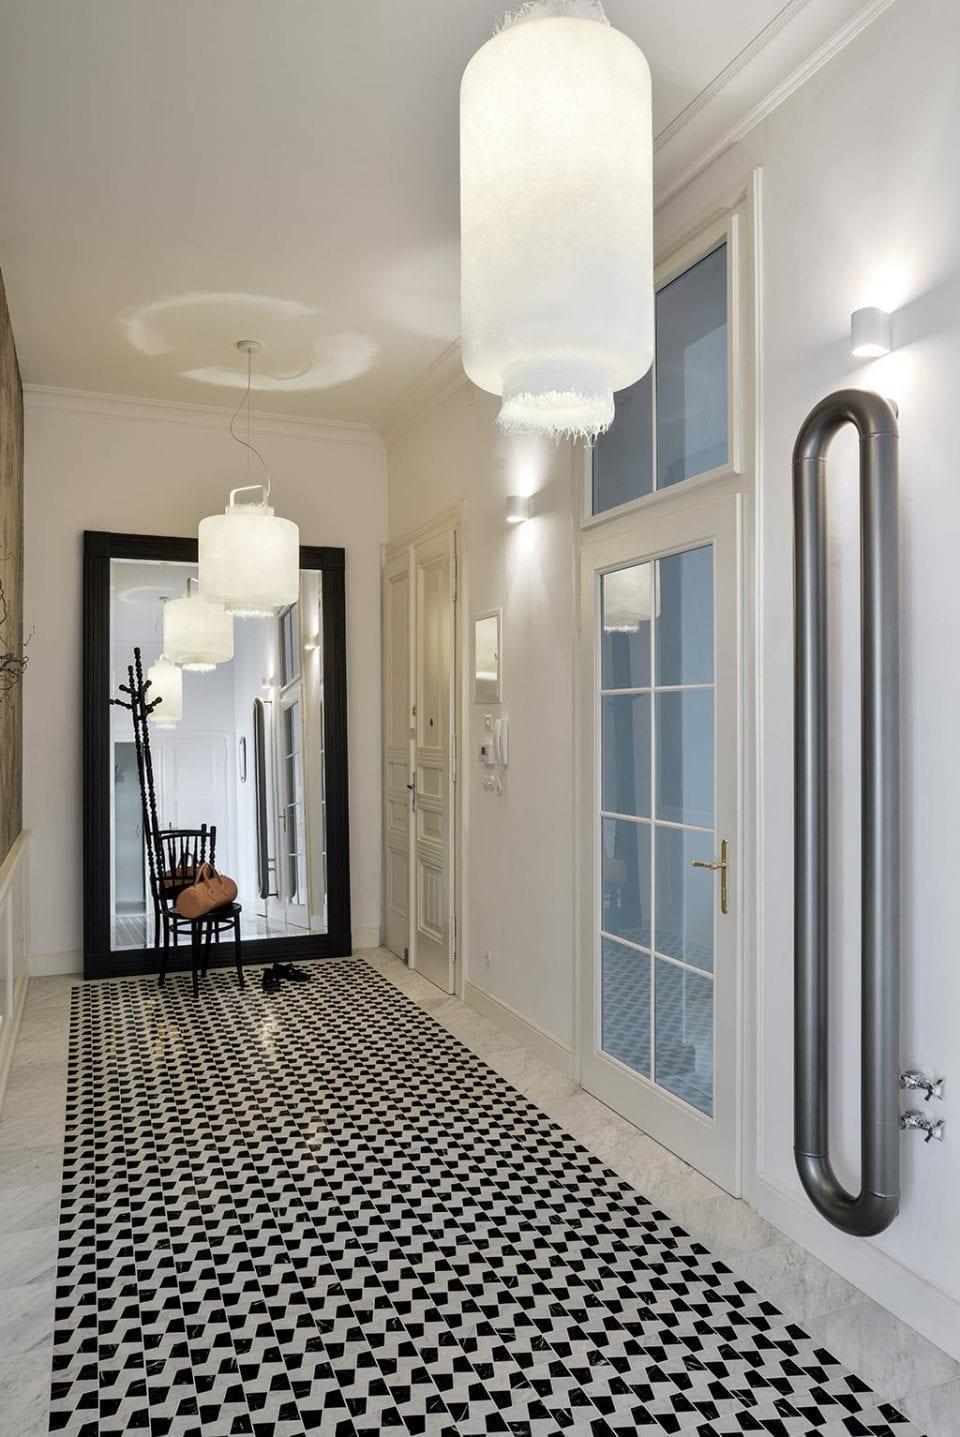 PN22 960x1437 - Look Inside: 1930s Czech Republic Apartment Re-invisioned